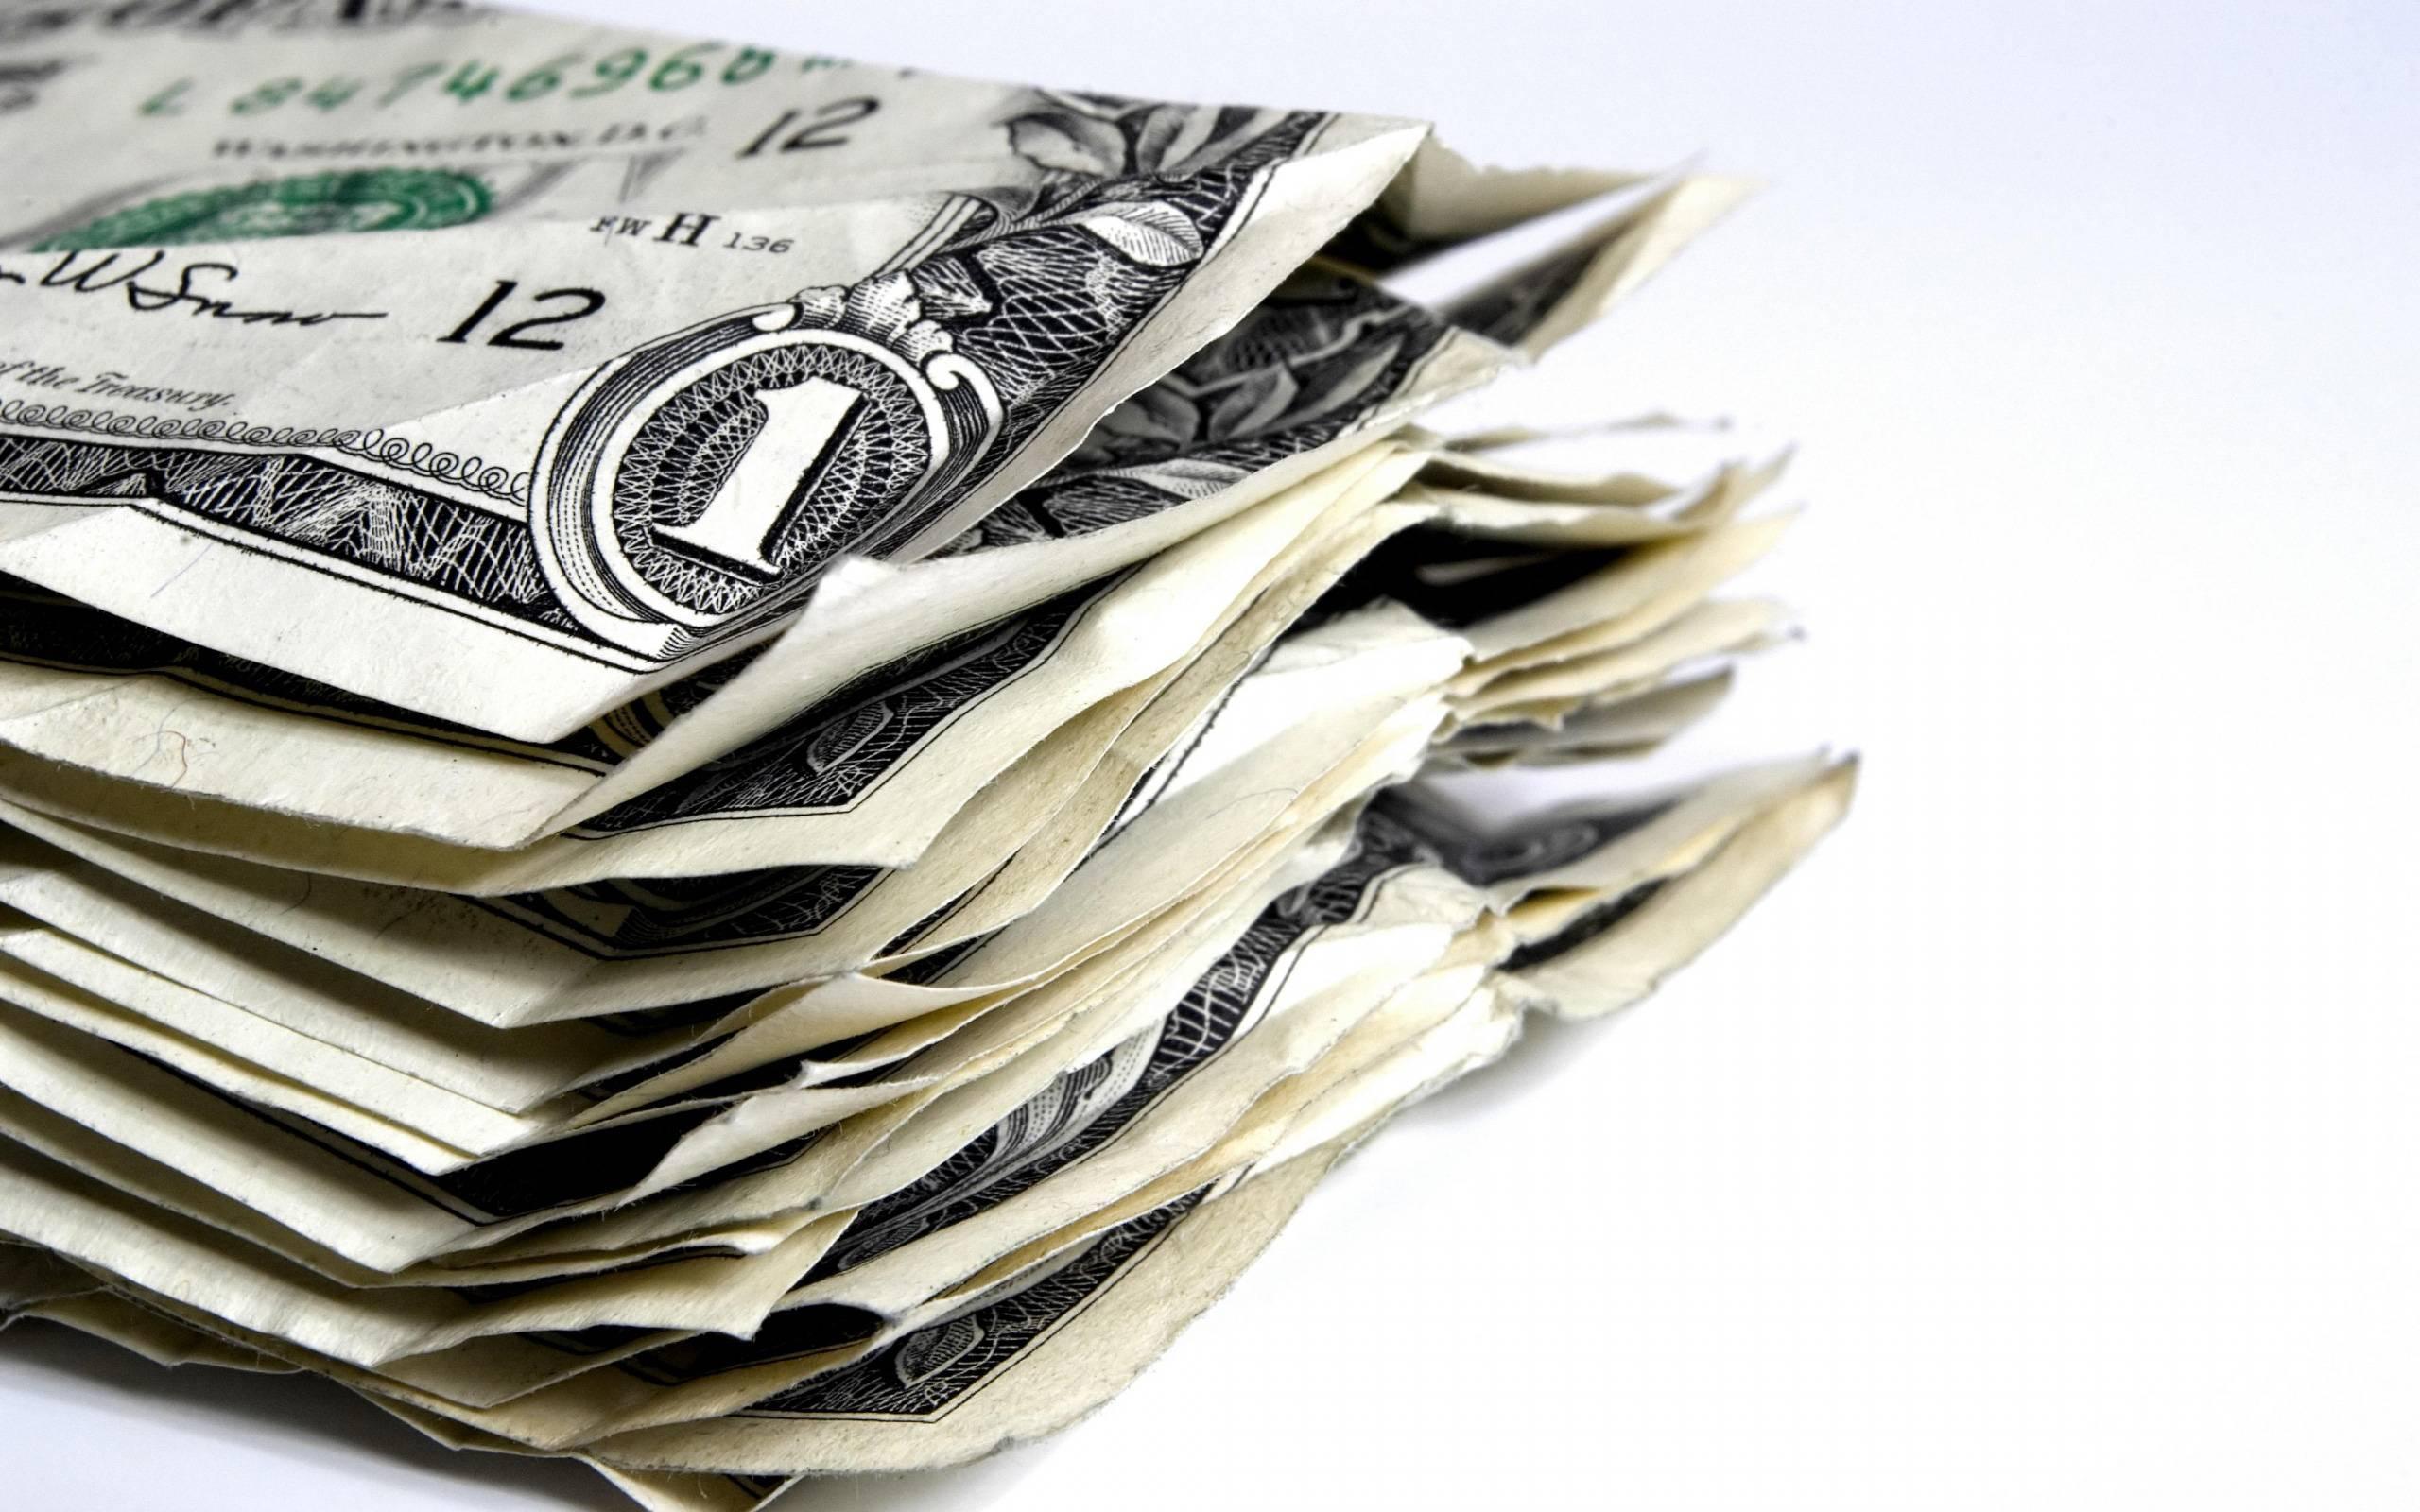 money-646771263541b85ead74dce6179f8d9e.jpg